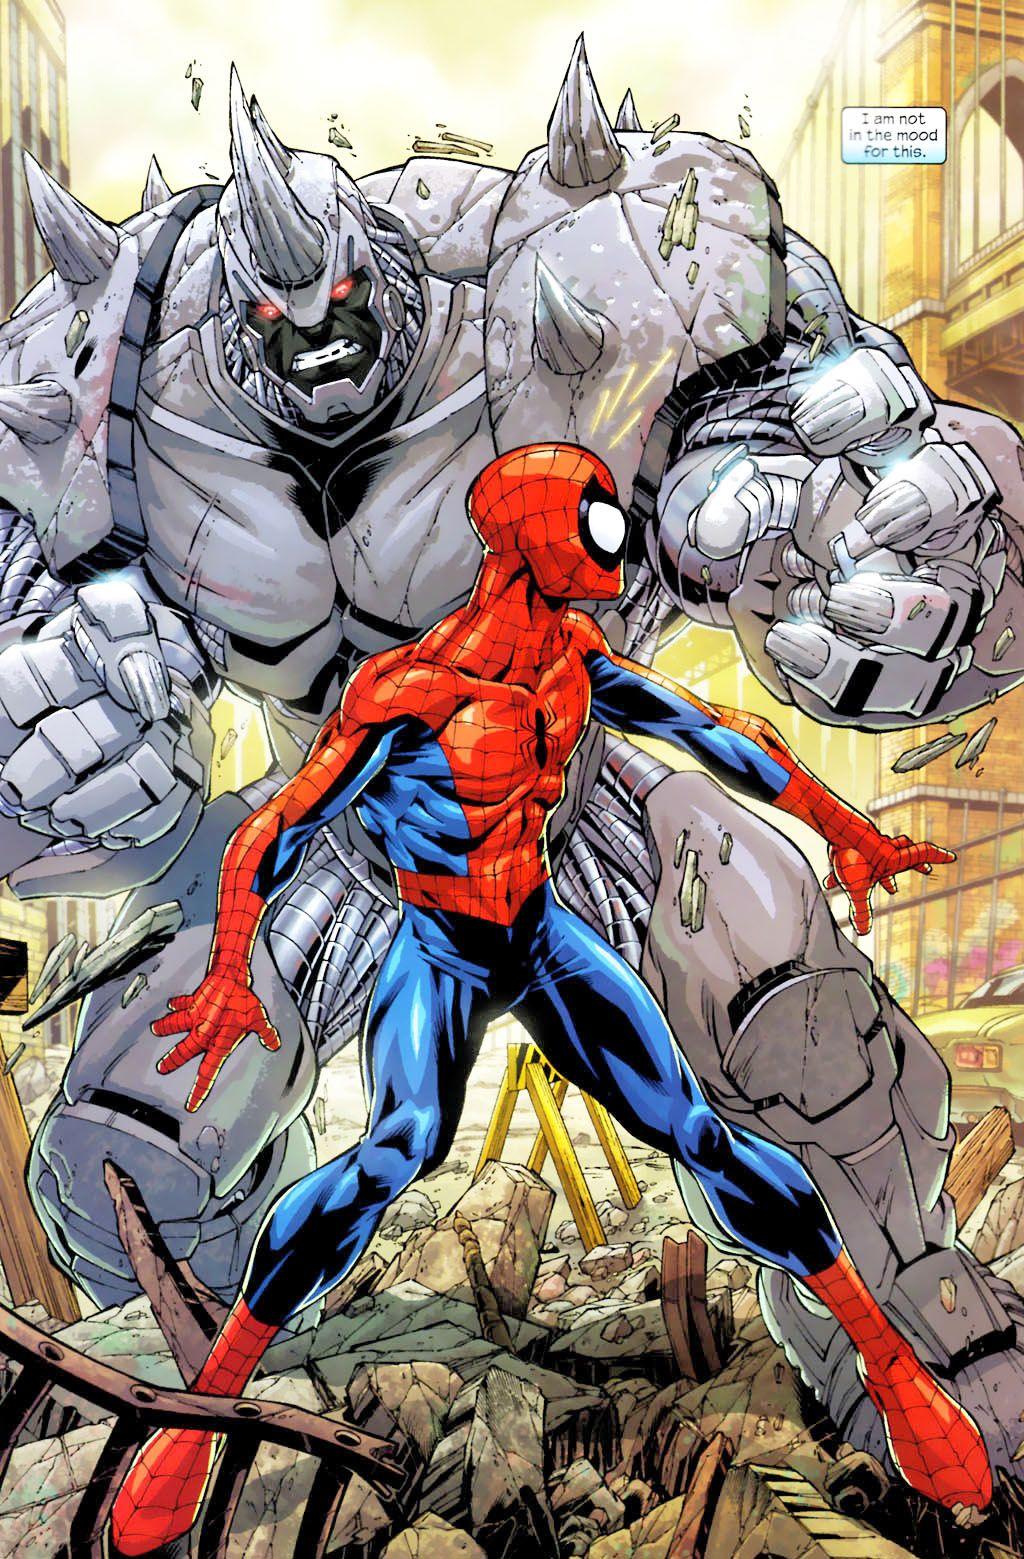 black spiderman vs rhino - photo #37